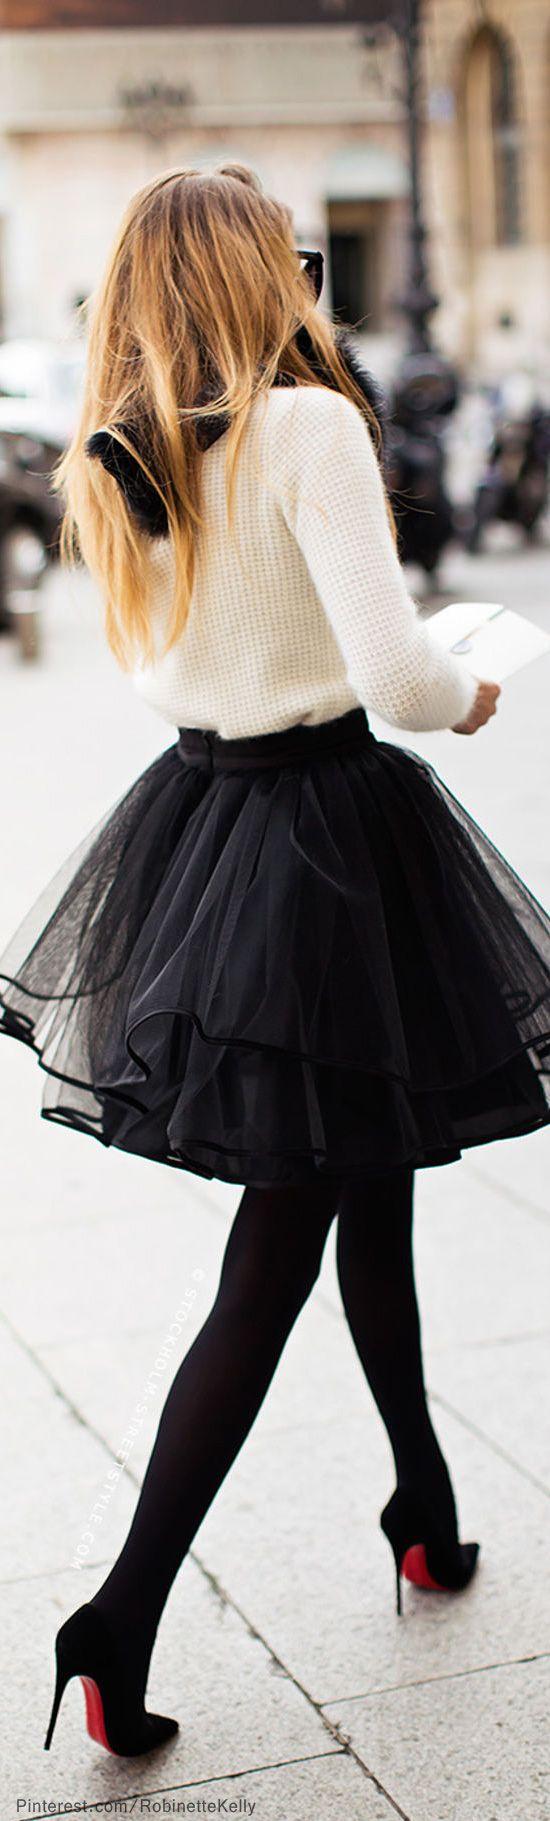 Street style black s